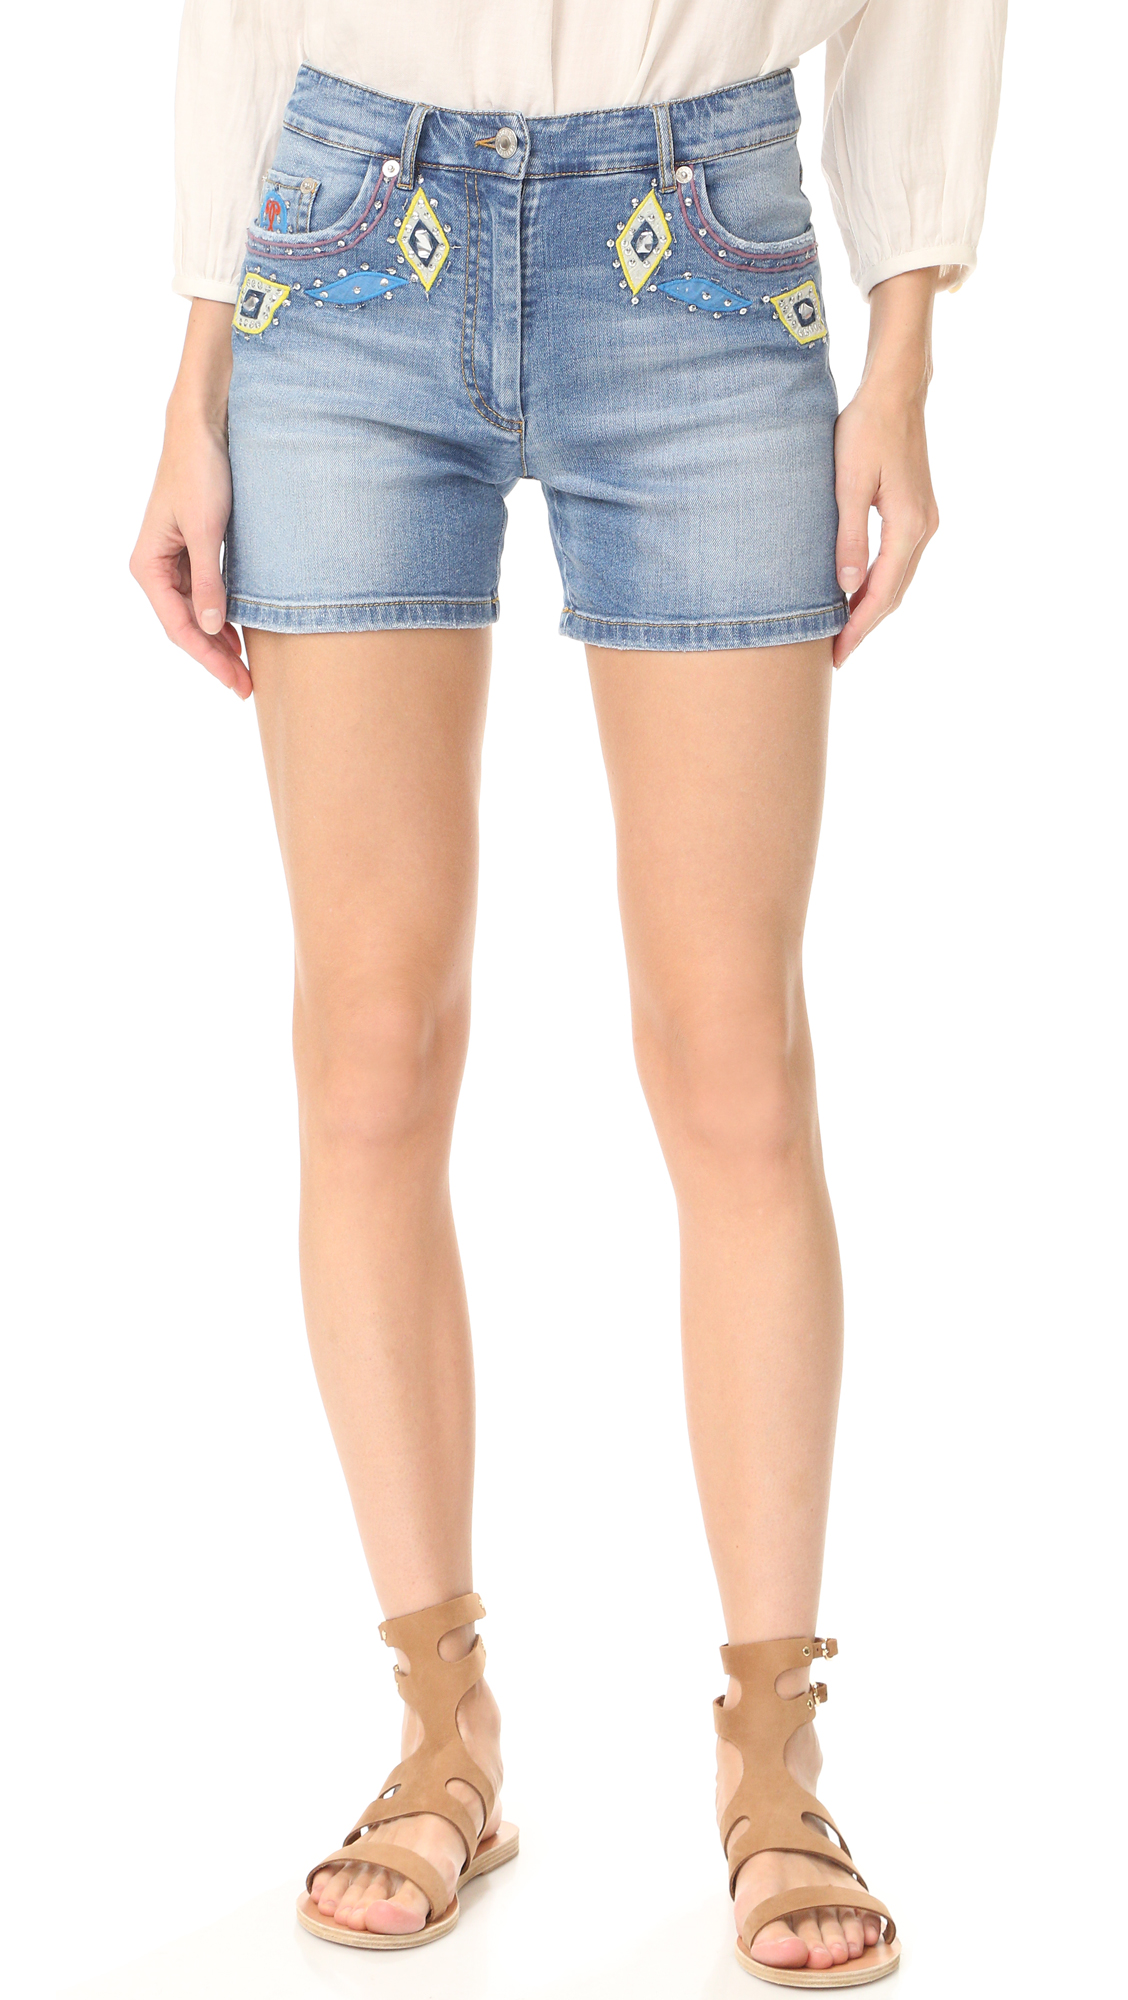 Moschino Denim Shorts - Light Blue at Shopbop